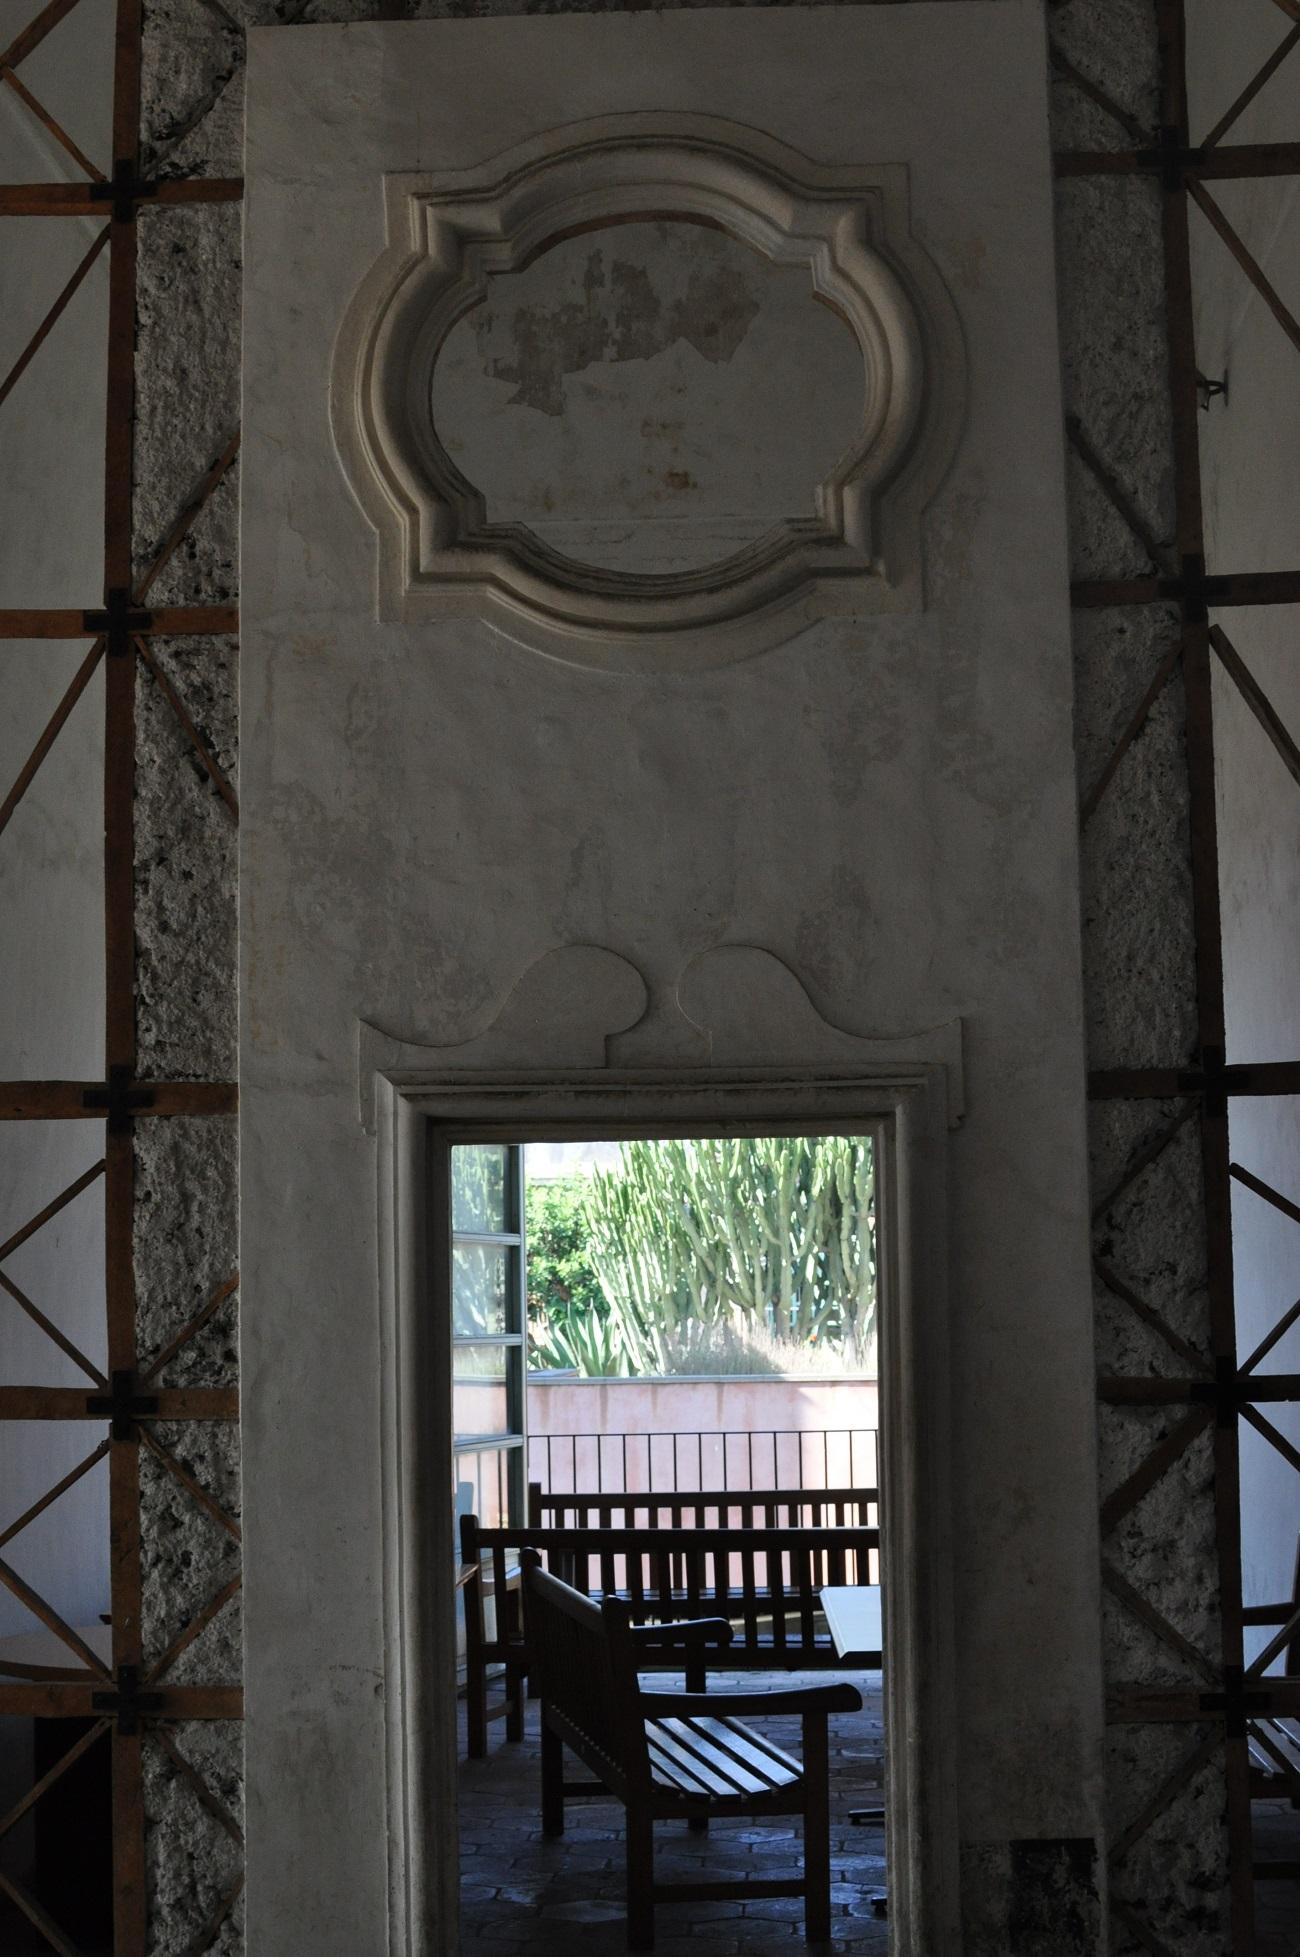 rocaille-blog-catania-sicilia-orientale-tour-52